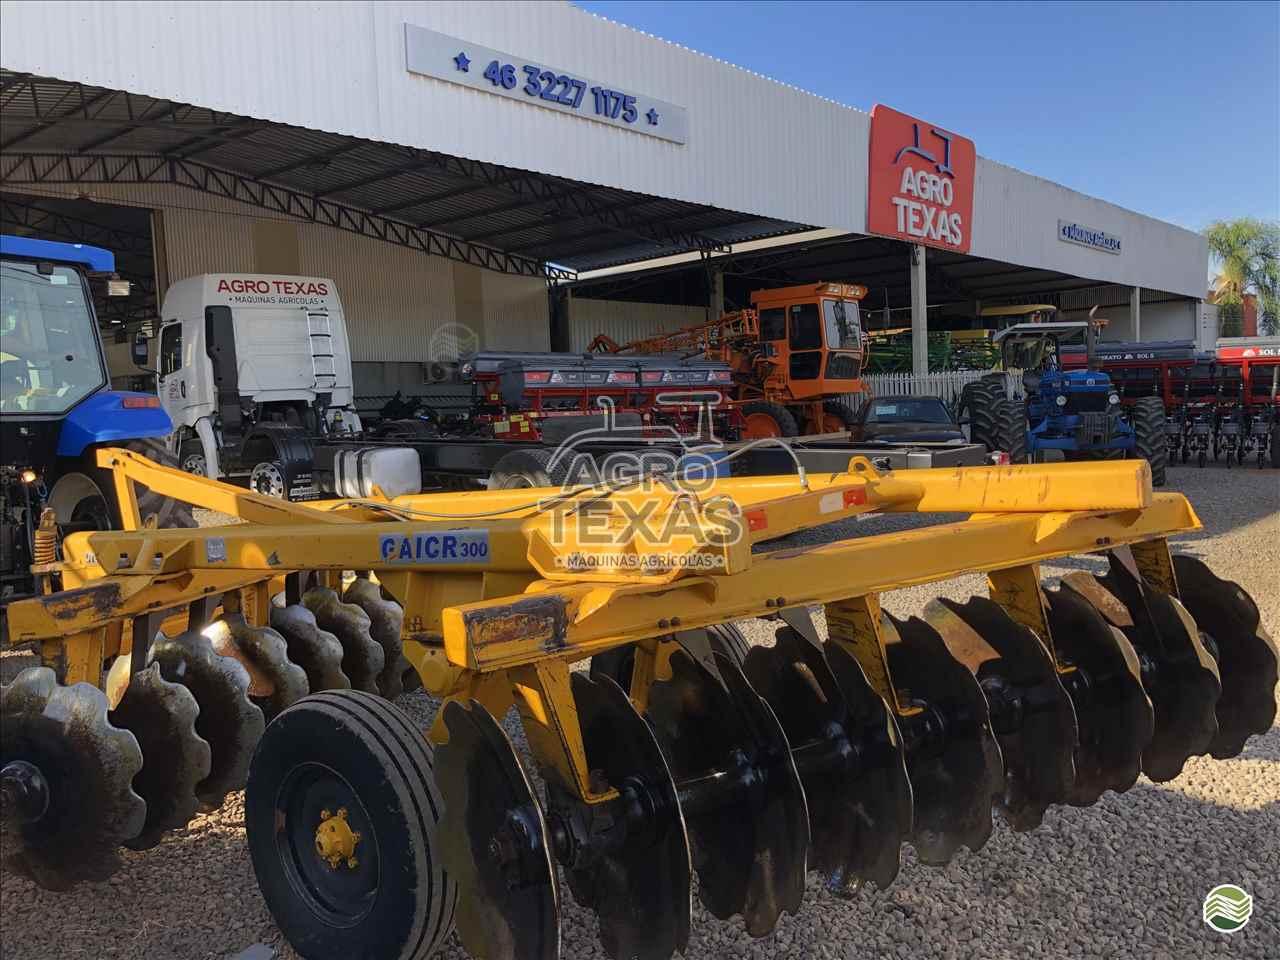 IMPLEMENTOS AGRICOLAS GRADE ARADORA ARADORA 18 DISCOS Agro Texas Máquinas Agrícolas VITORINO PARANÁ PR